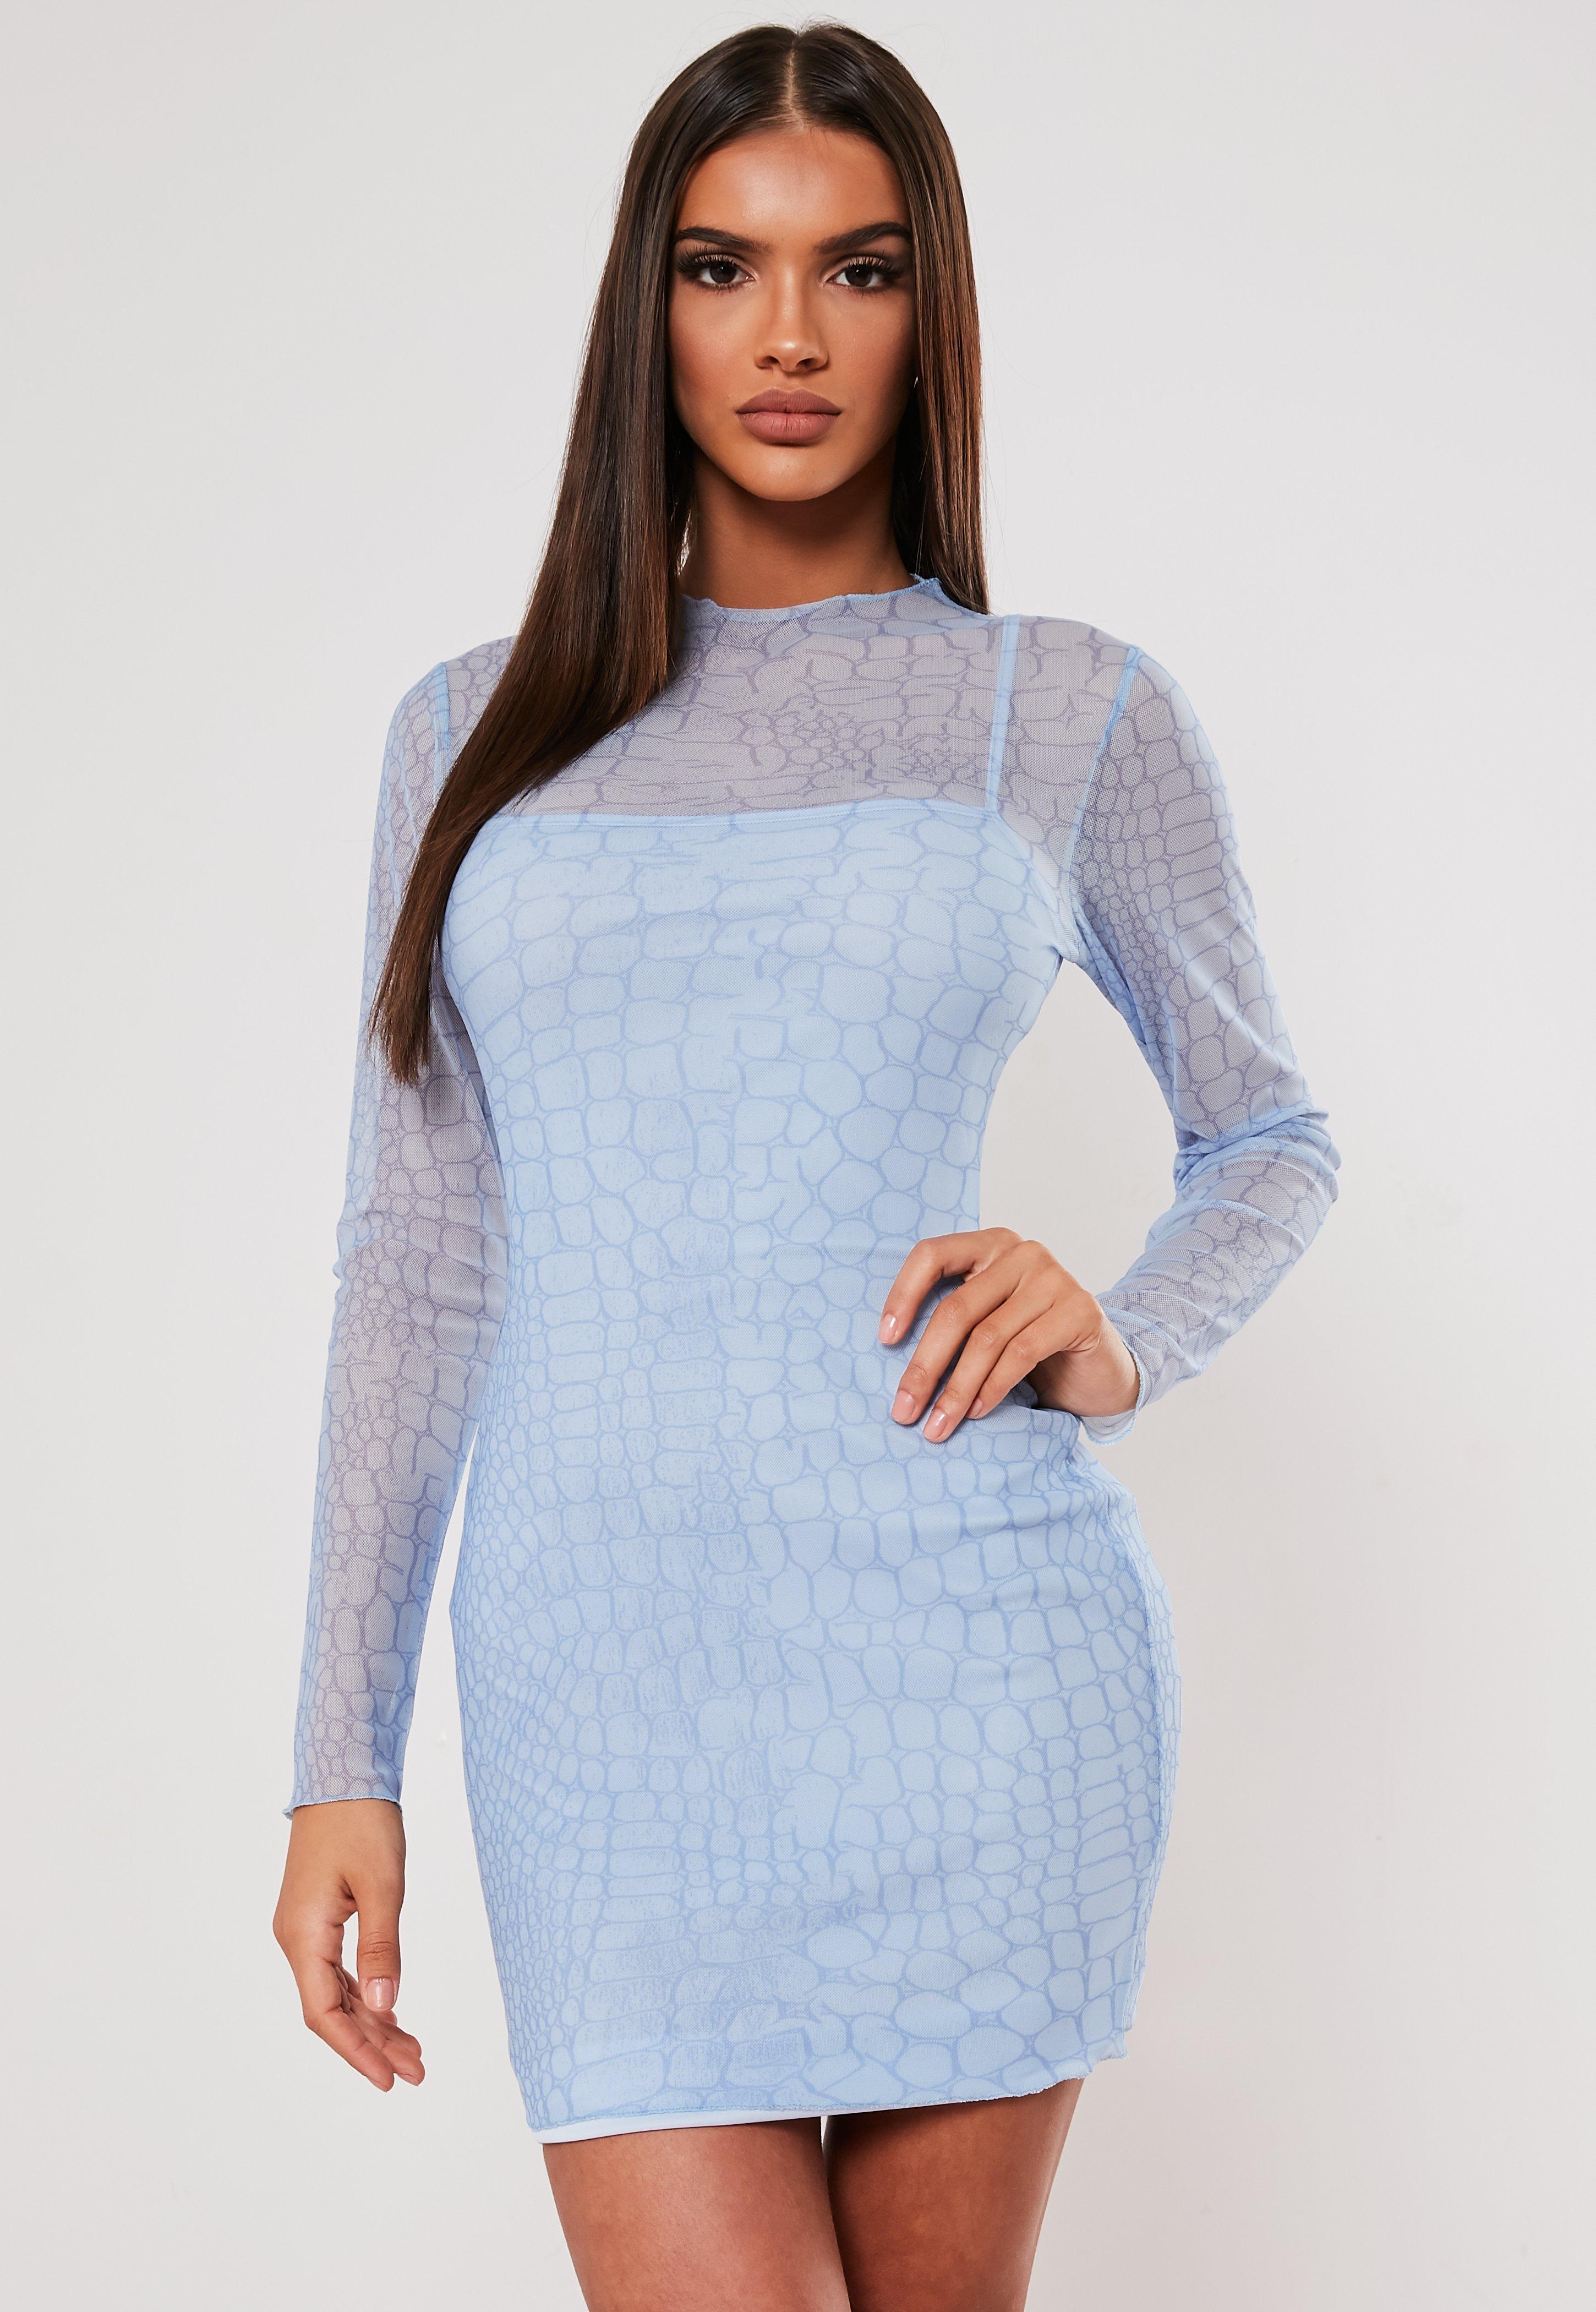 754c8eaae194a Robes   Robe chic femme en ligne 2019 - Missguided